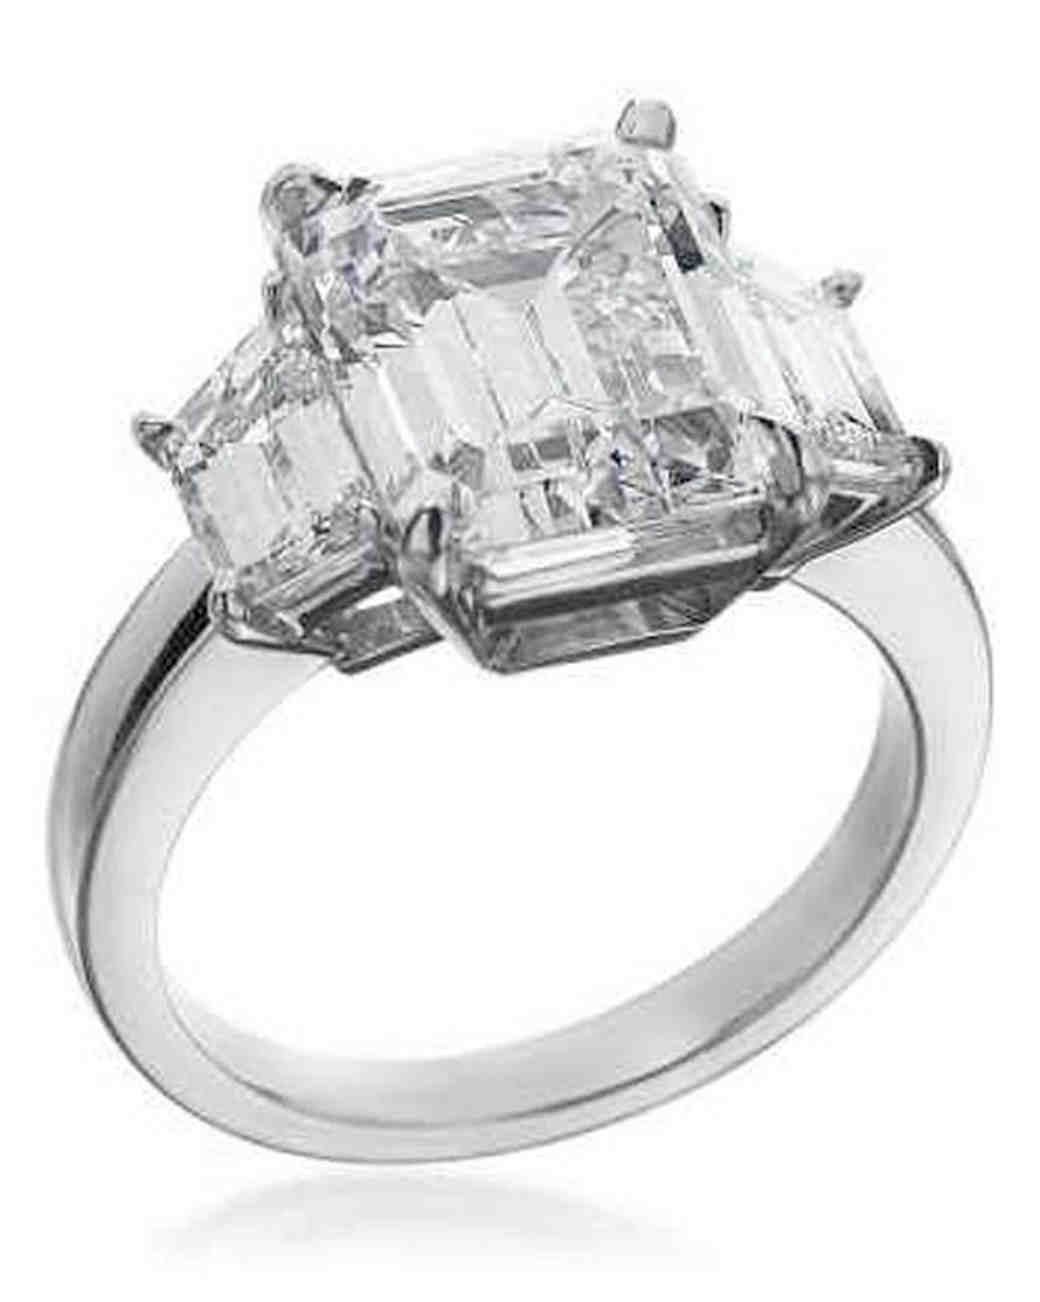 Michael C. Fina Emerald-Cut Engagement Ring